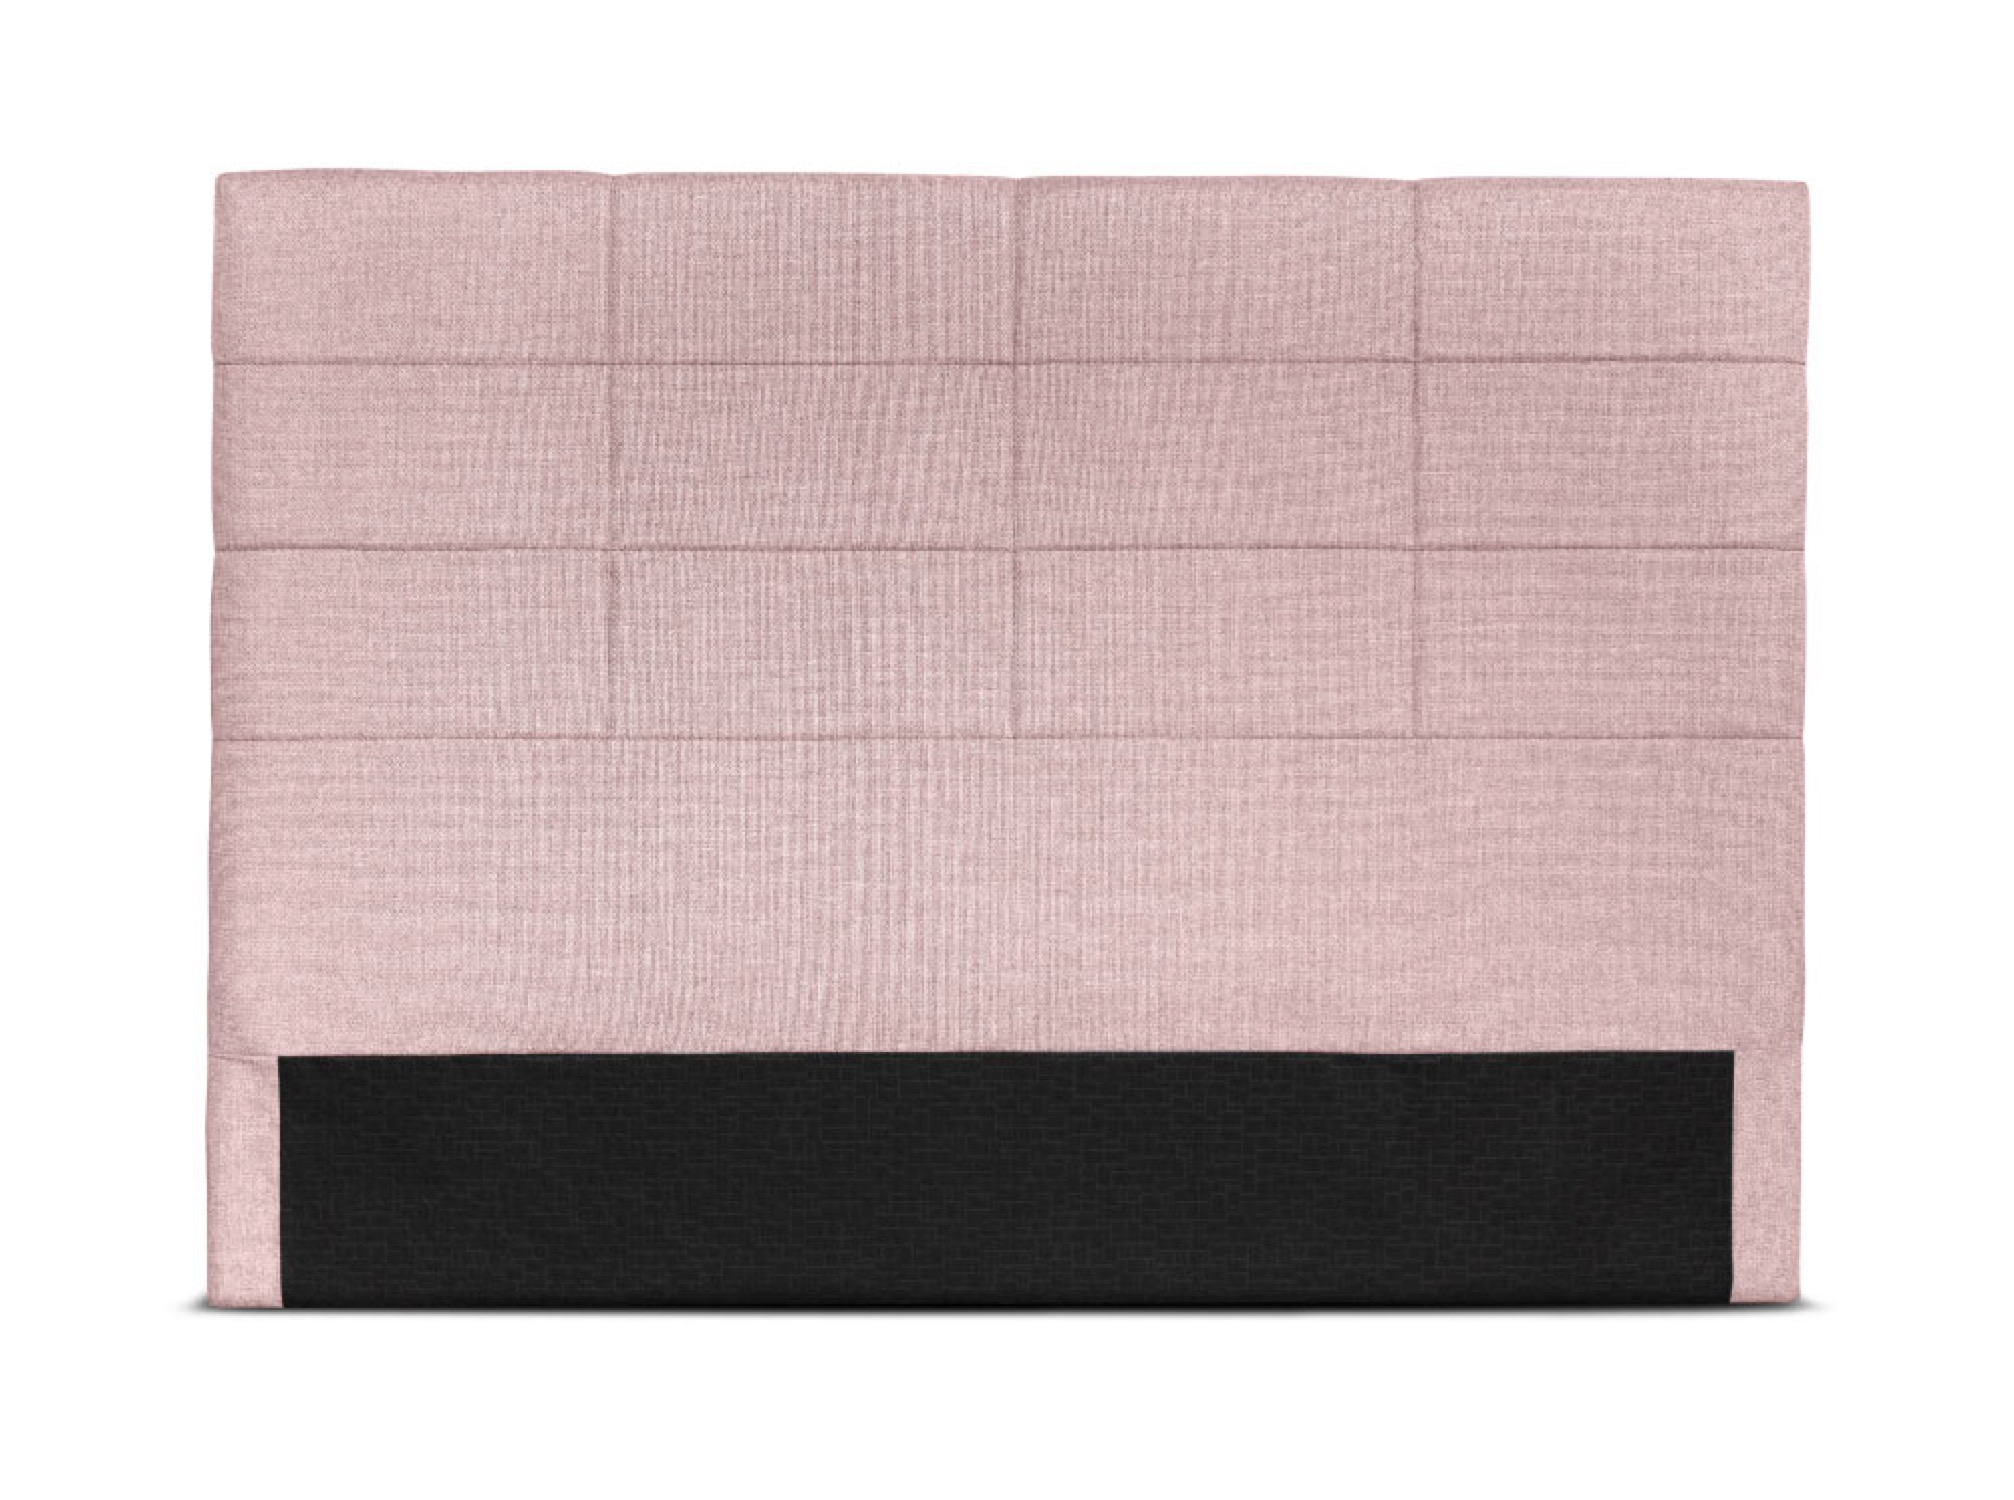 Tête de lit en tissu rose - 160cm